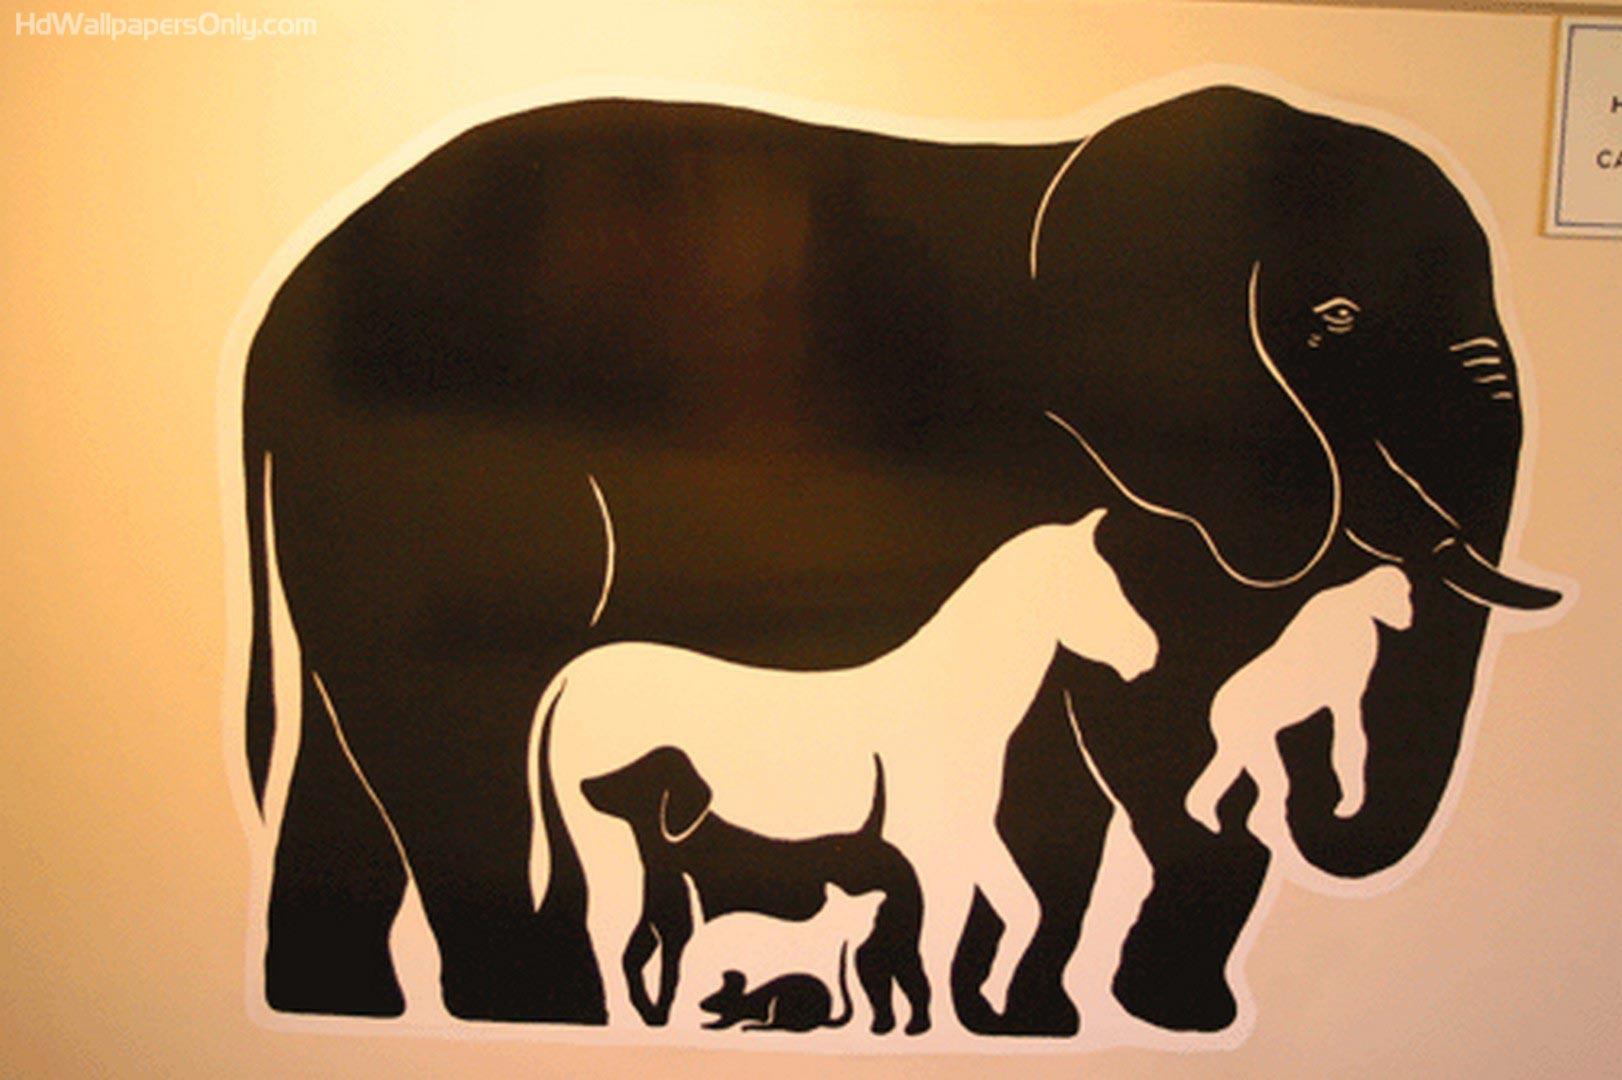 Optičke varke - Page 12 Elephant-on-the-wall-optical-illusion